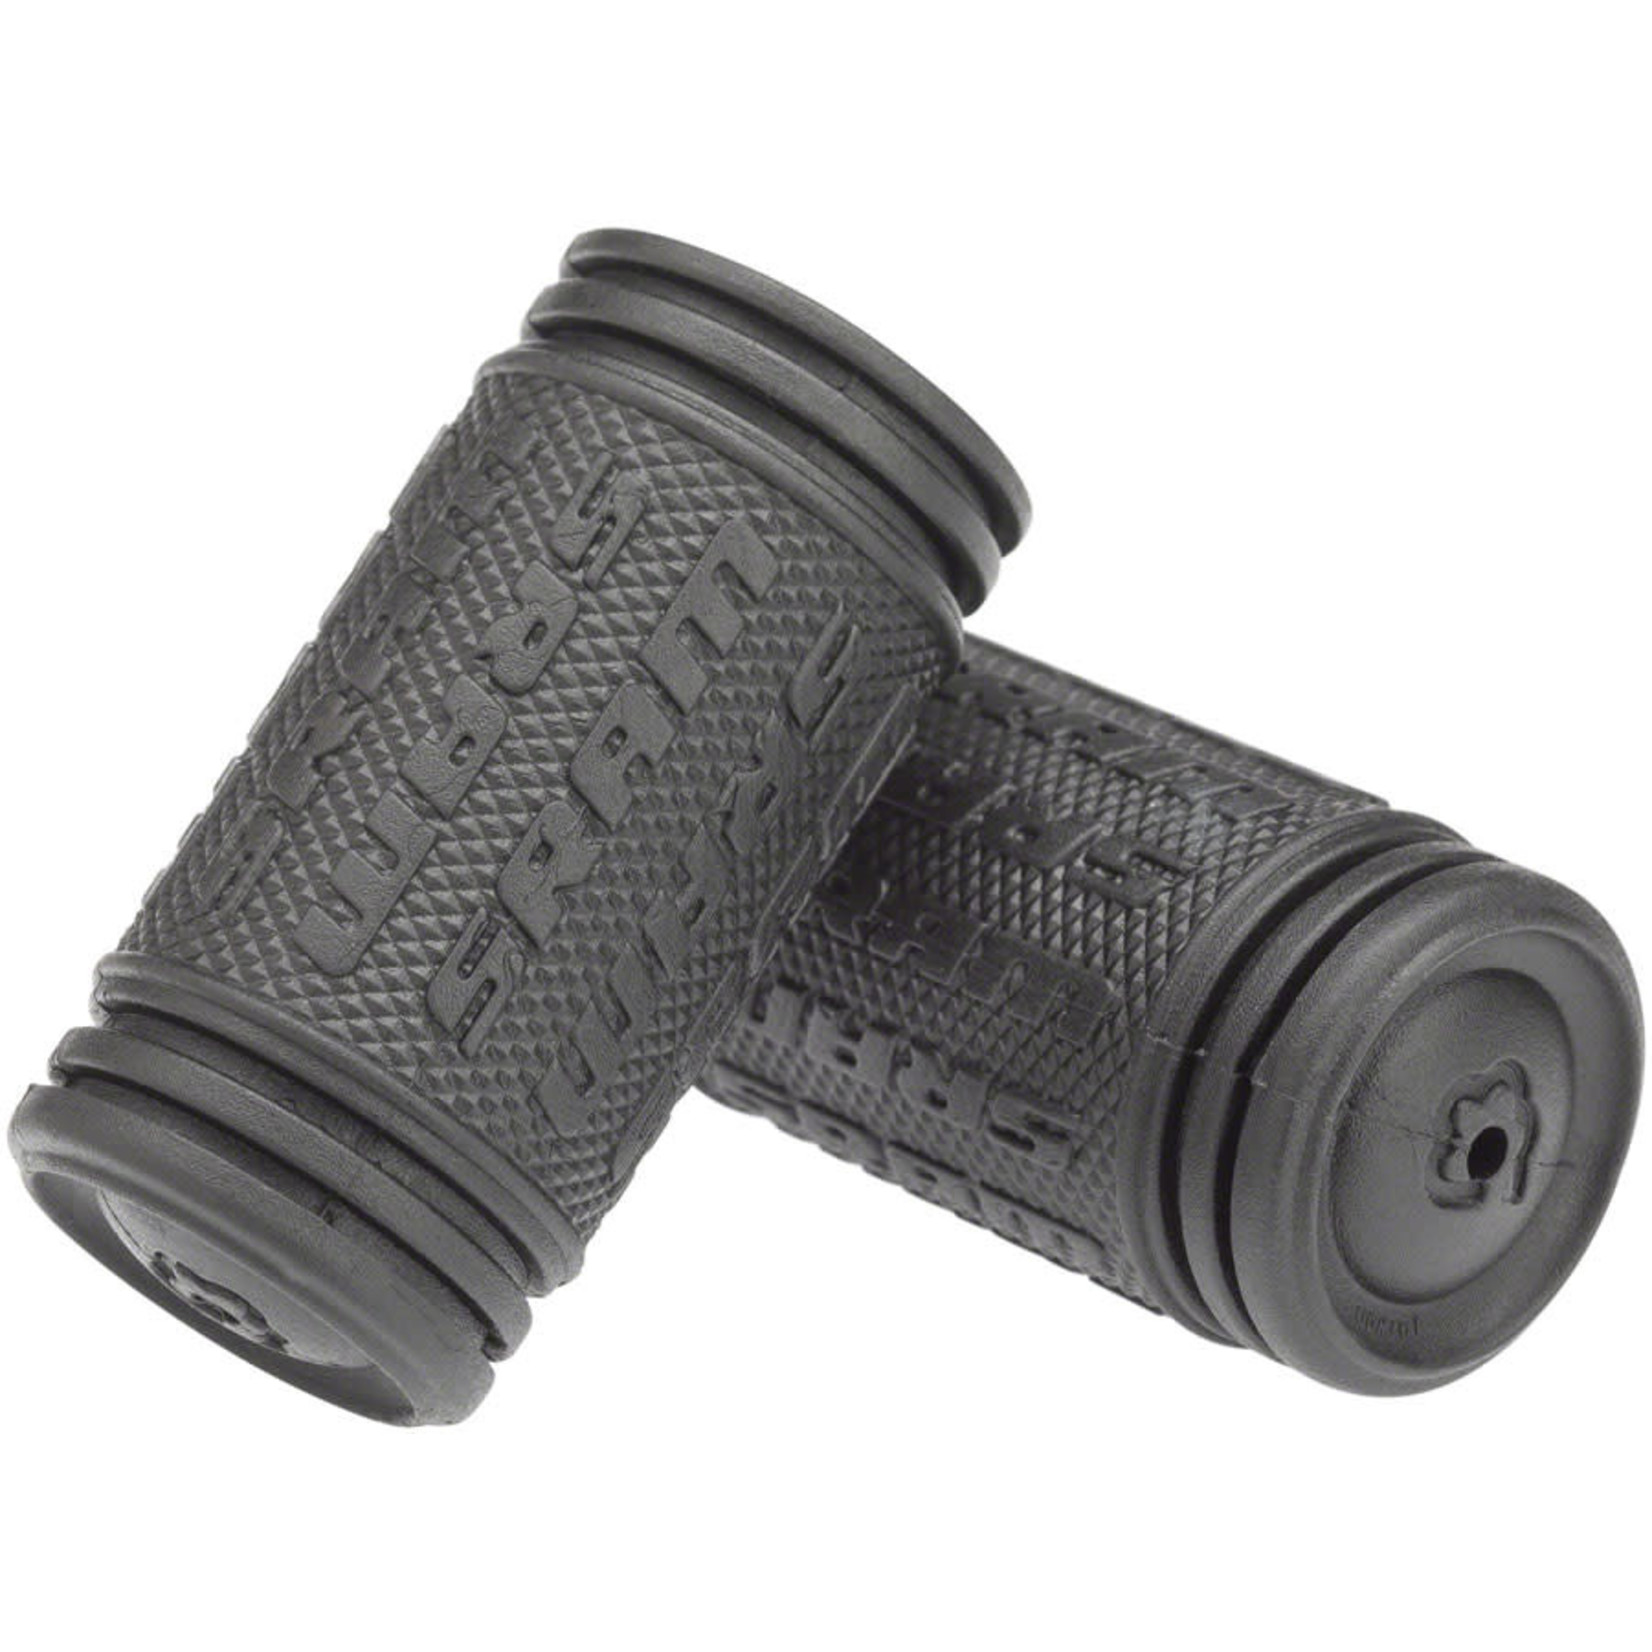 SRAM SRAM Half Pipe Stationary Grips: Black